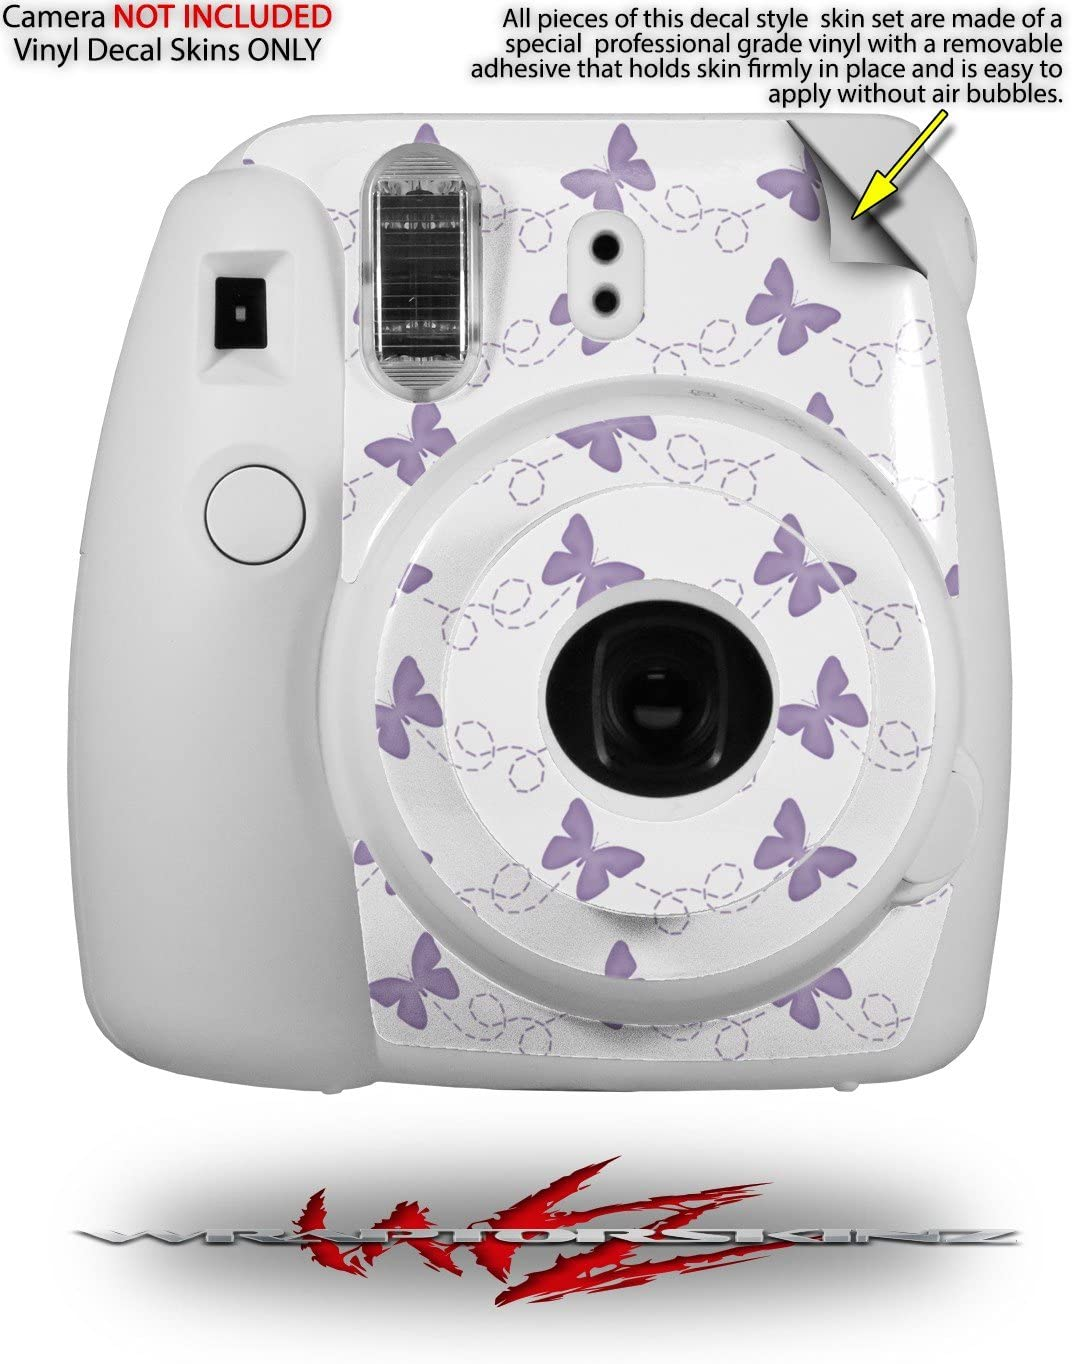 CAMERA NOT INCLUDED WraptorSkinz Skin Decal Wrap for Fujifilm Instax Mini 8 Camera Butterflies Green